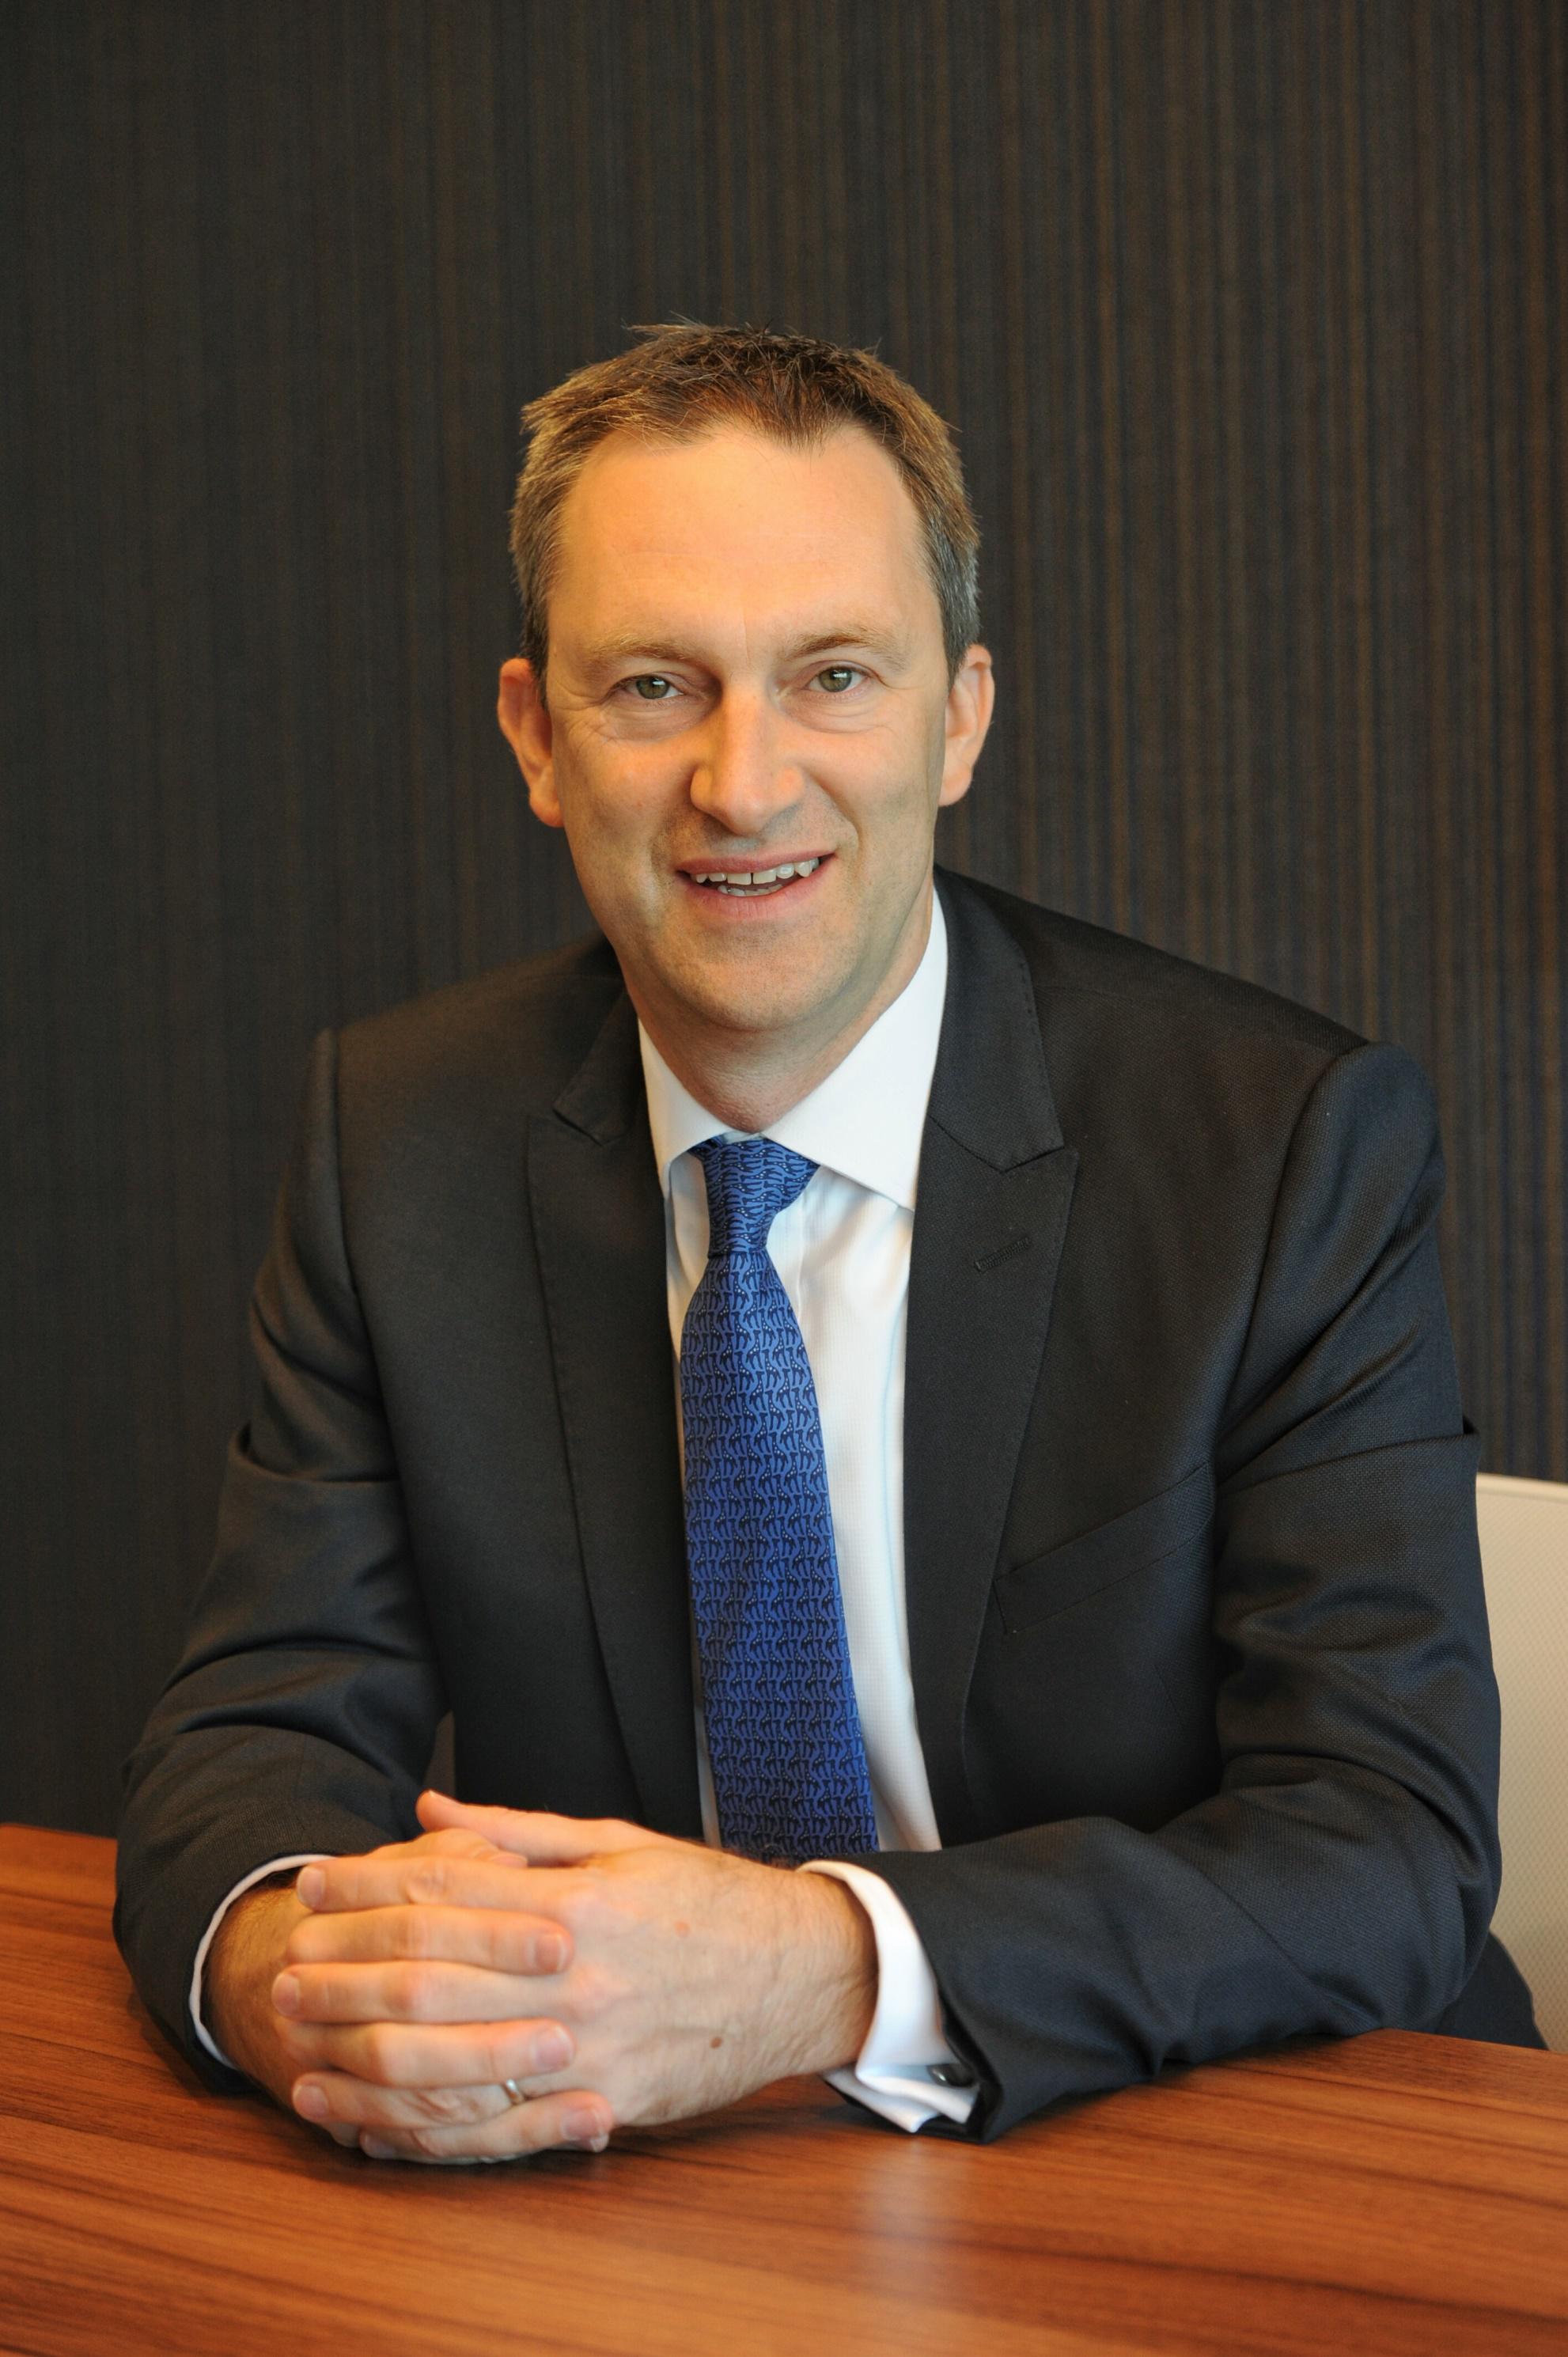 Damian Cope, Διευθύνων Σύμβουλος ΟΠΑΠ